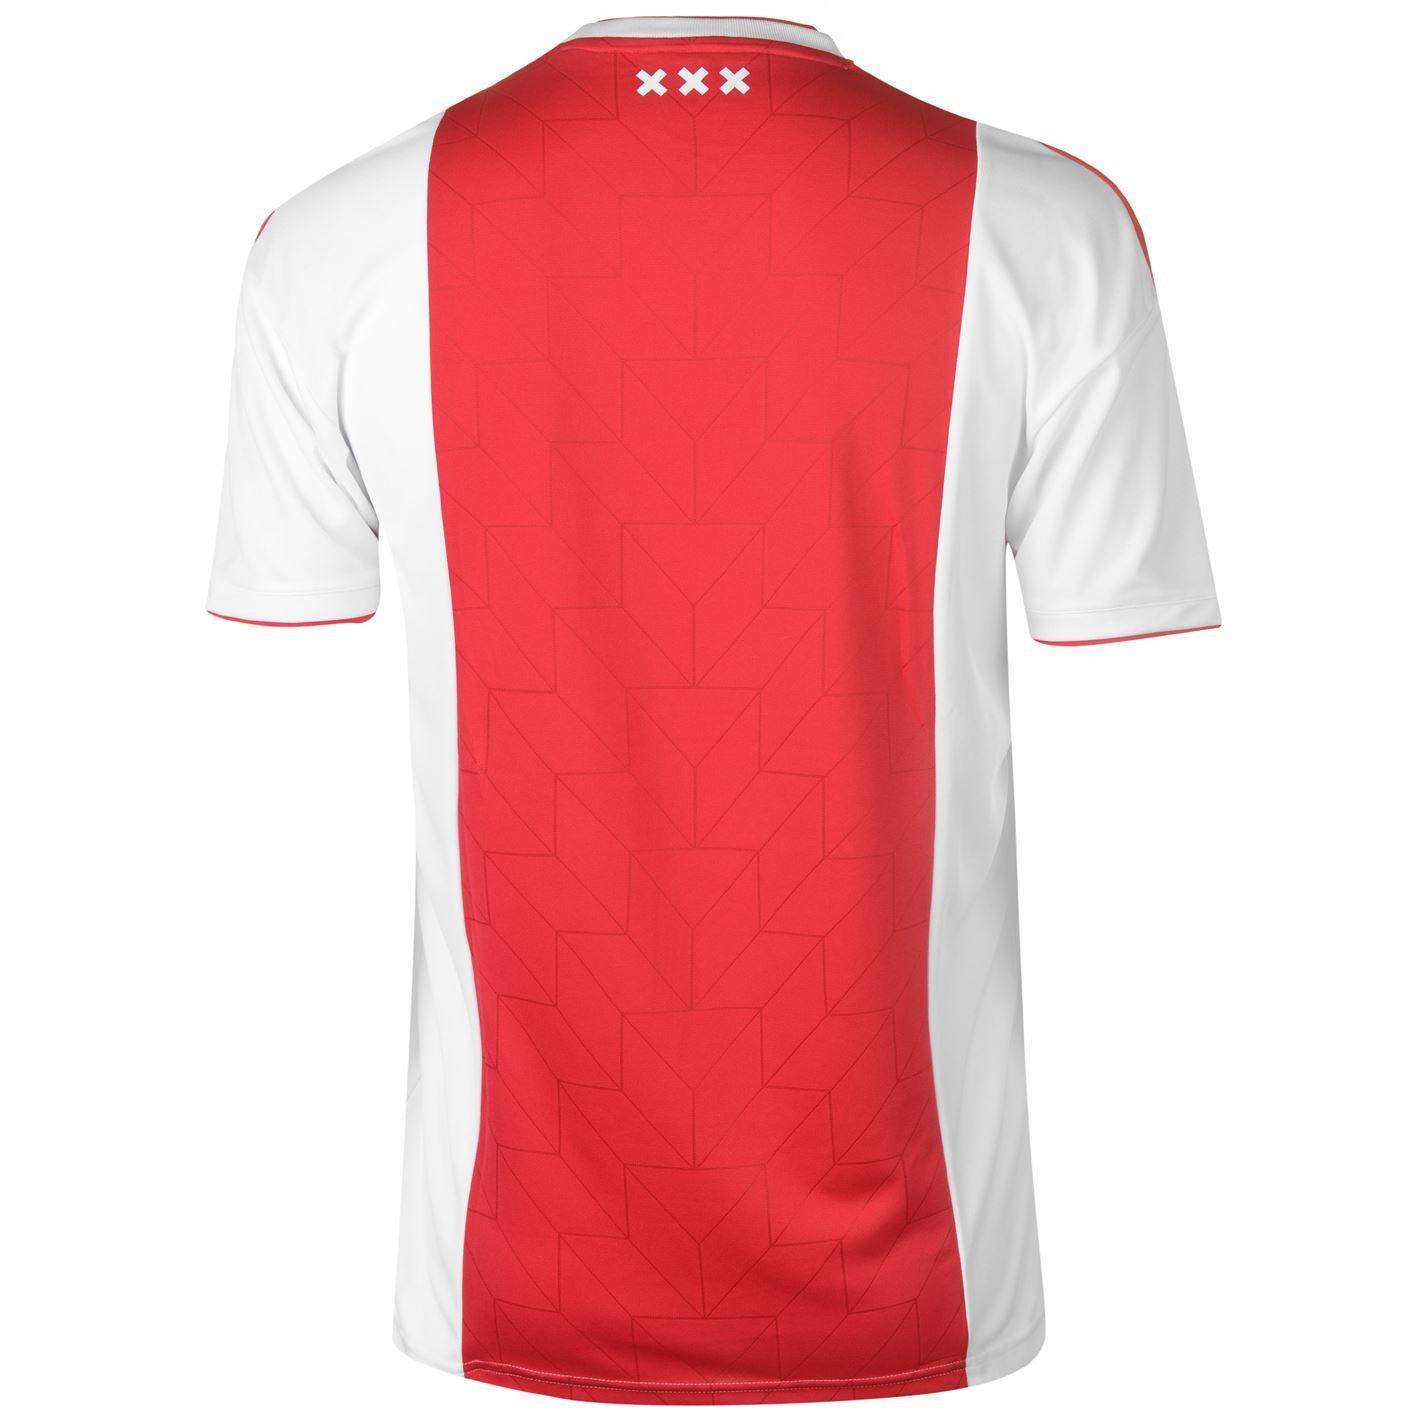 cd4676206d0 Amazon.com : adidas 2018-2019 Ajax Home Football Shirt : Sports & Outdoors